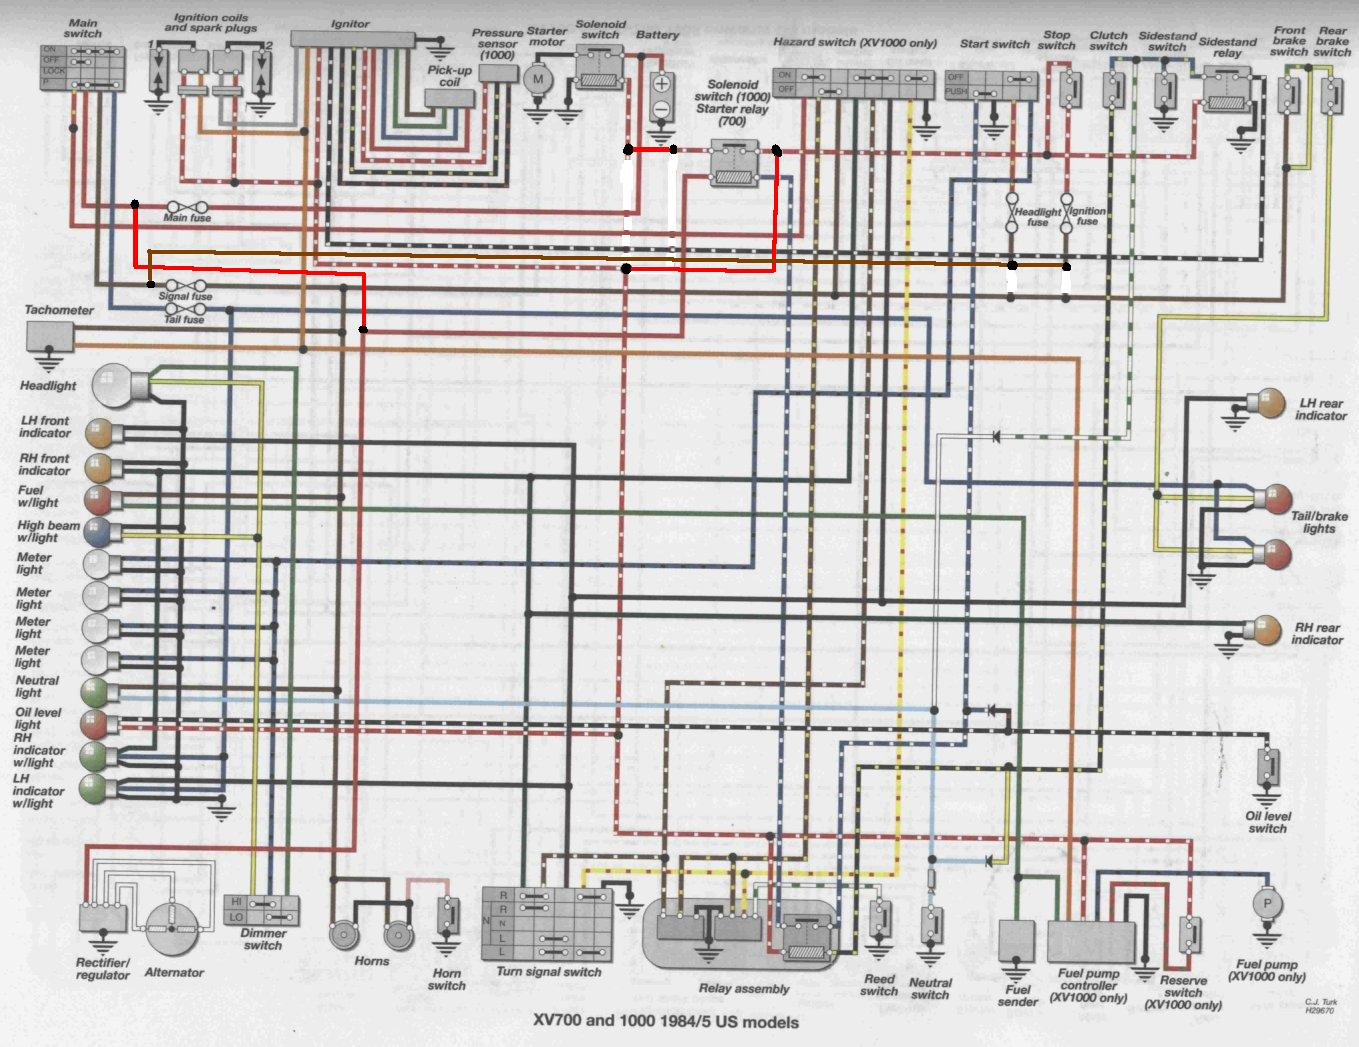 1983 Yamaha Maxim 750 Starter Button Wiring Diagram